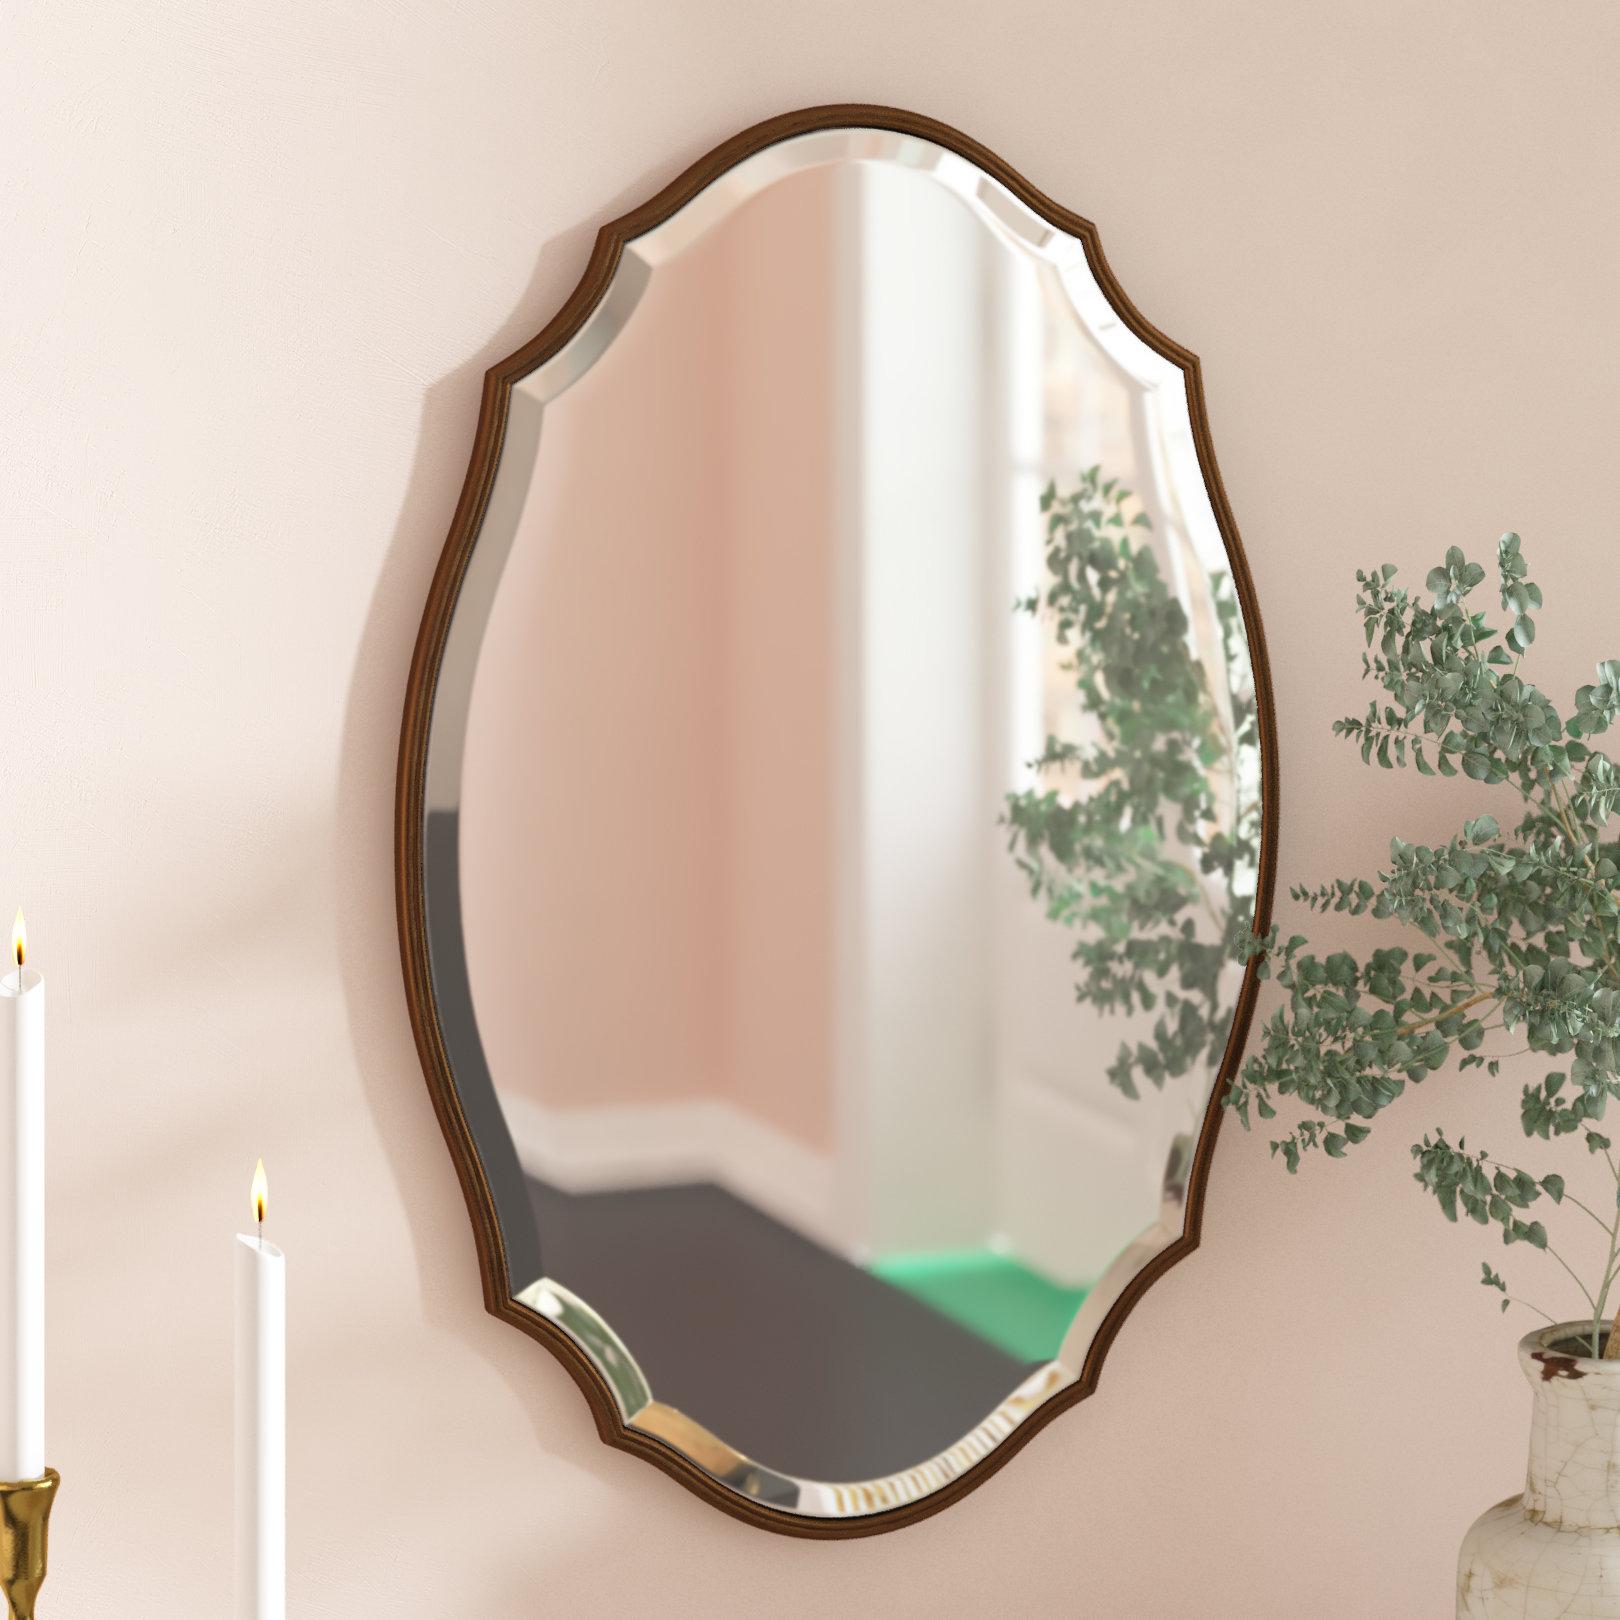 Rosdorf Park Modern & Contemporary Beveled Accent Mirror In Guidinha Modern & Contemporary Accent Mirrors (View 8 of 20)